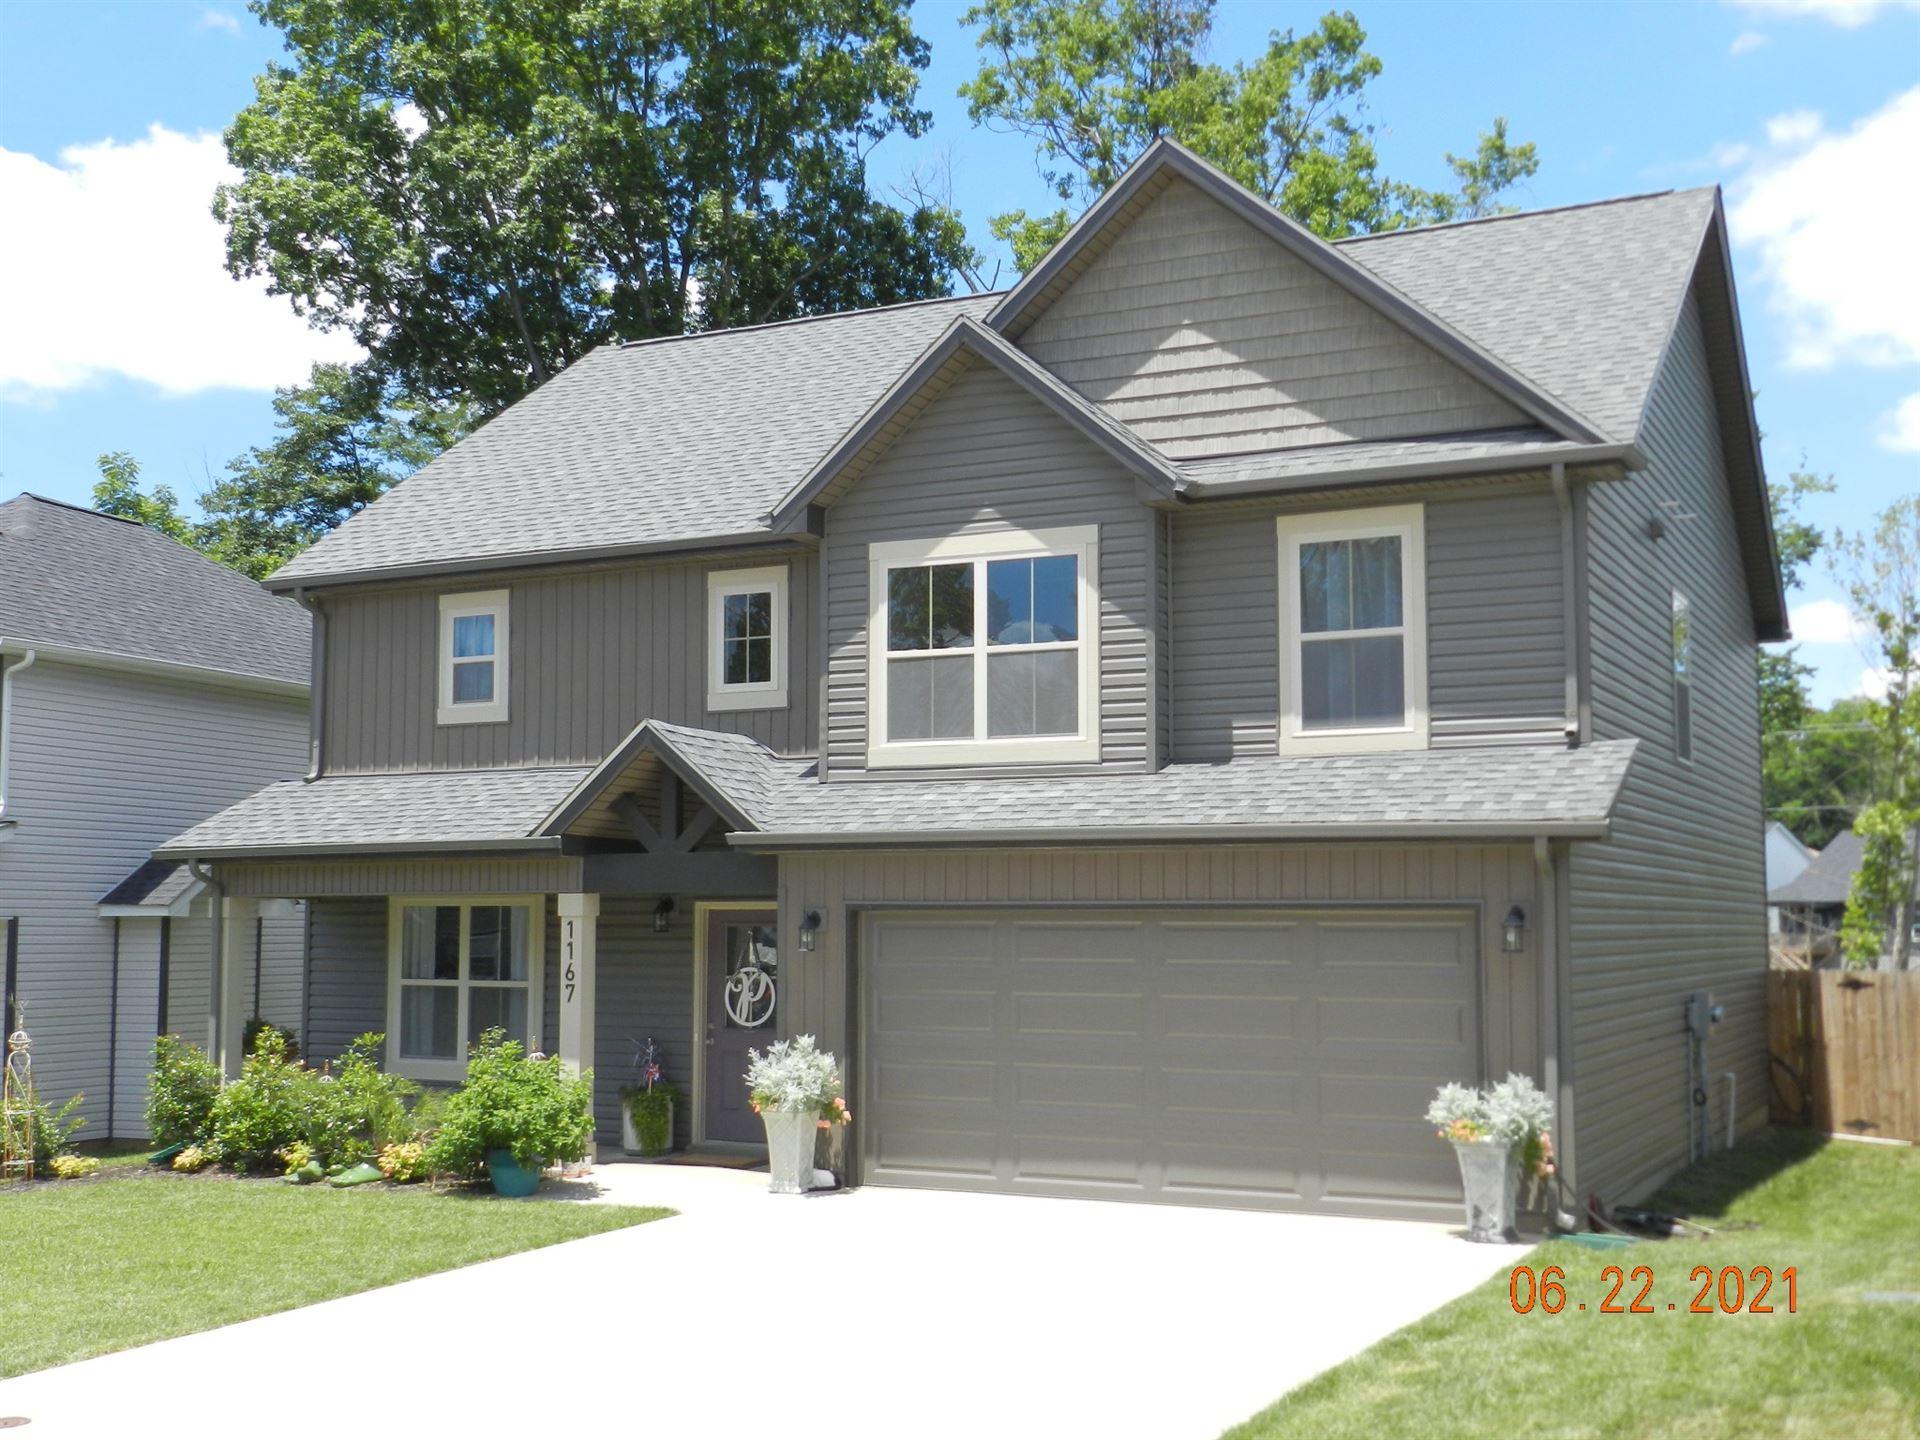 1167 Eagles Nest Ln, Clarksville, TN 37040 - MLS#: 2265508